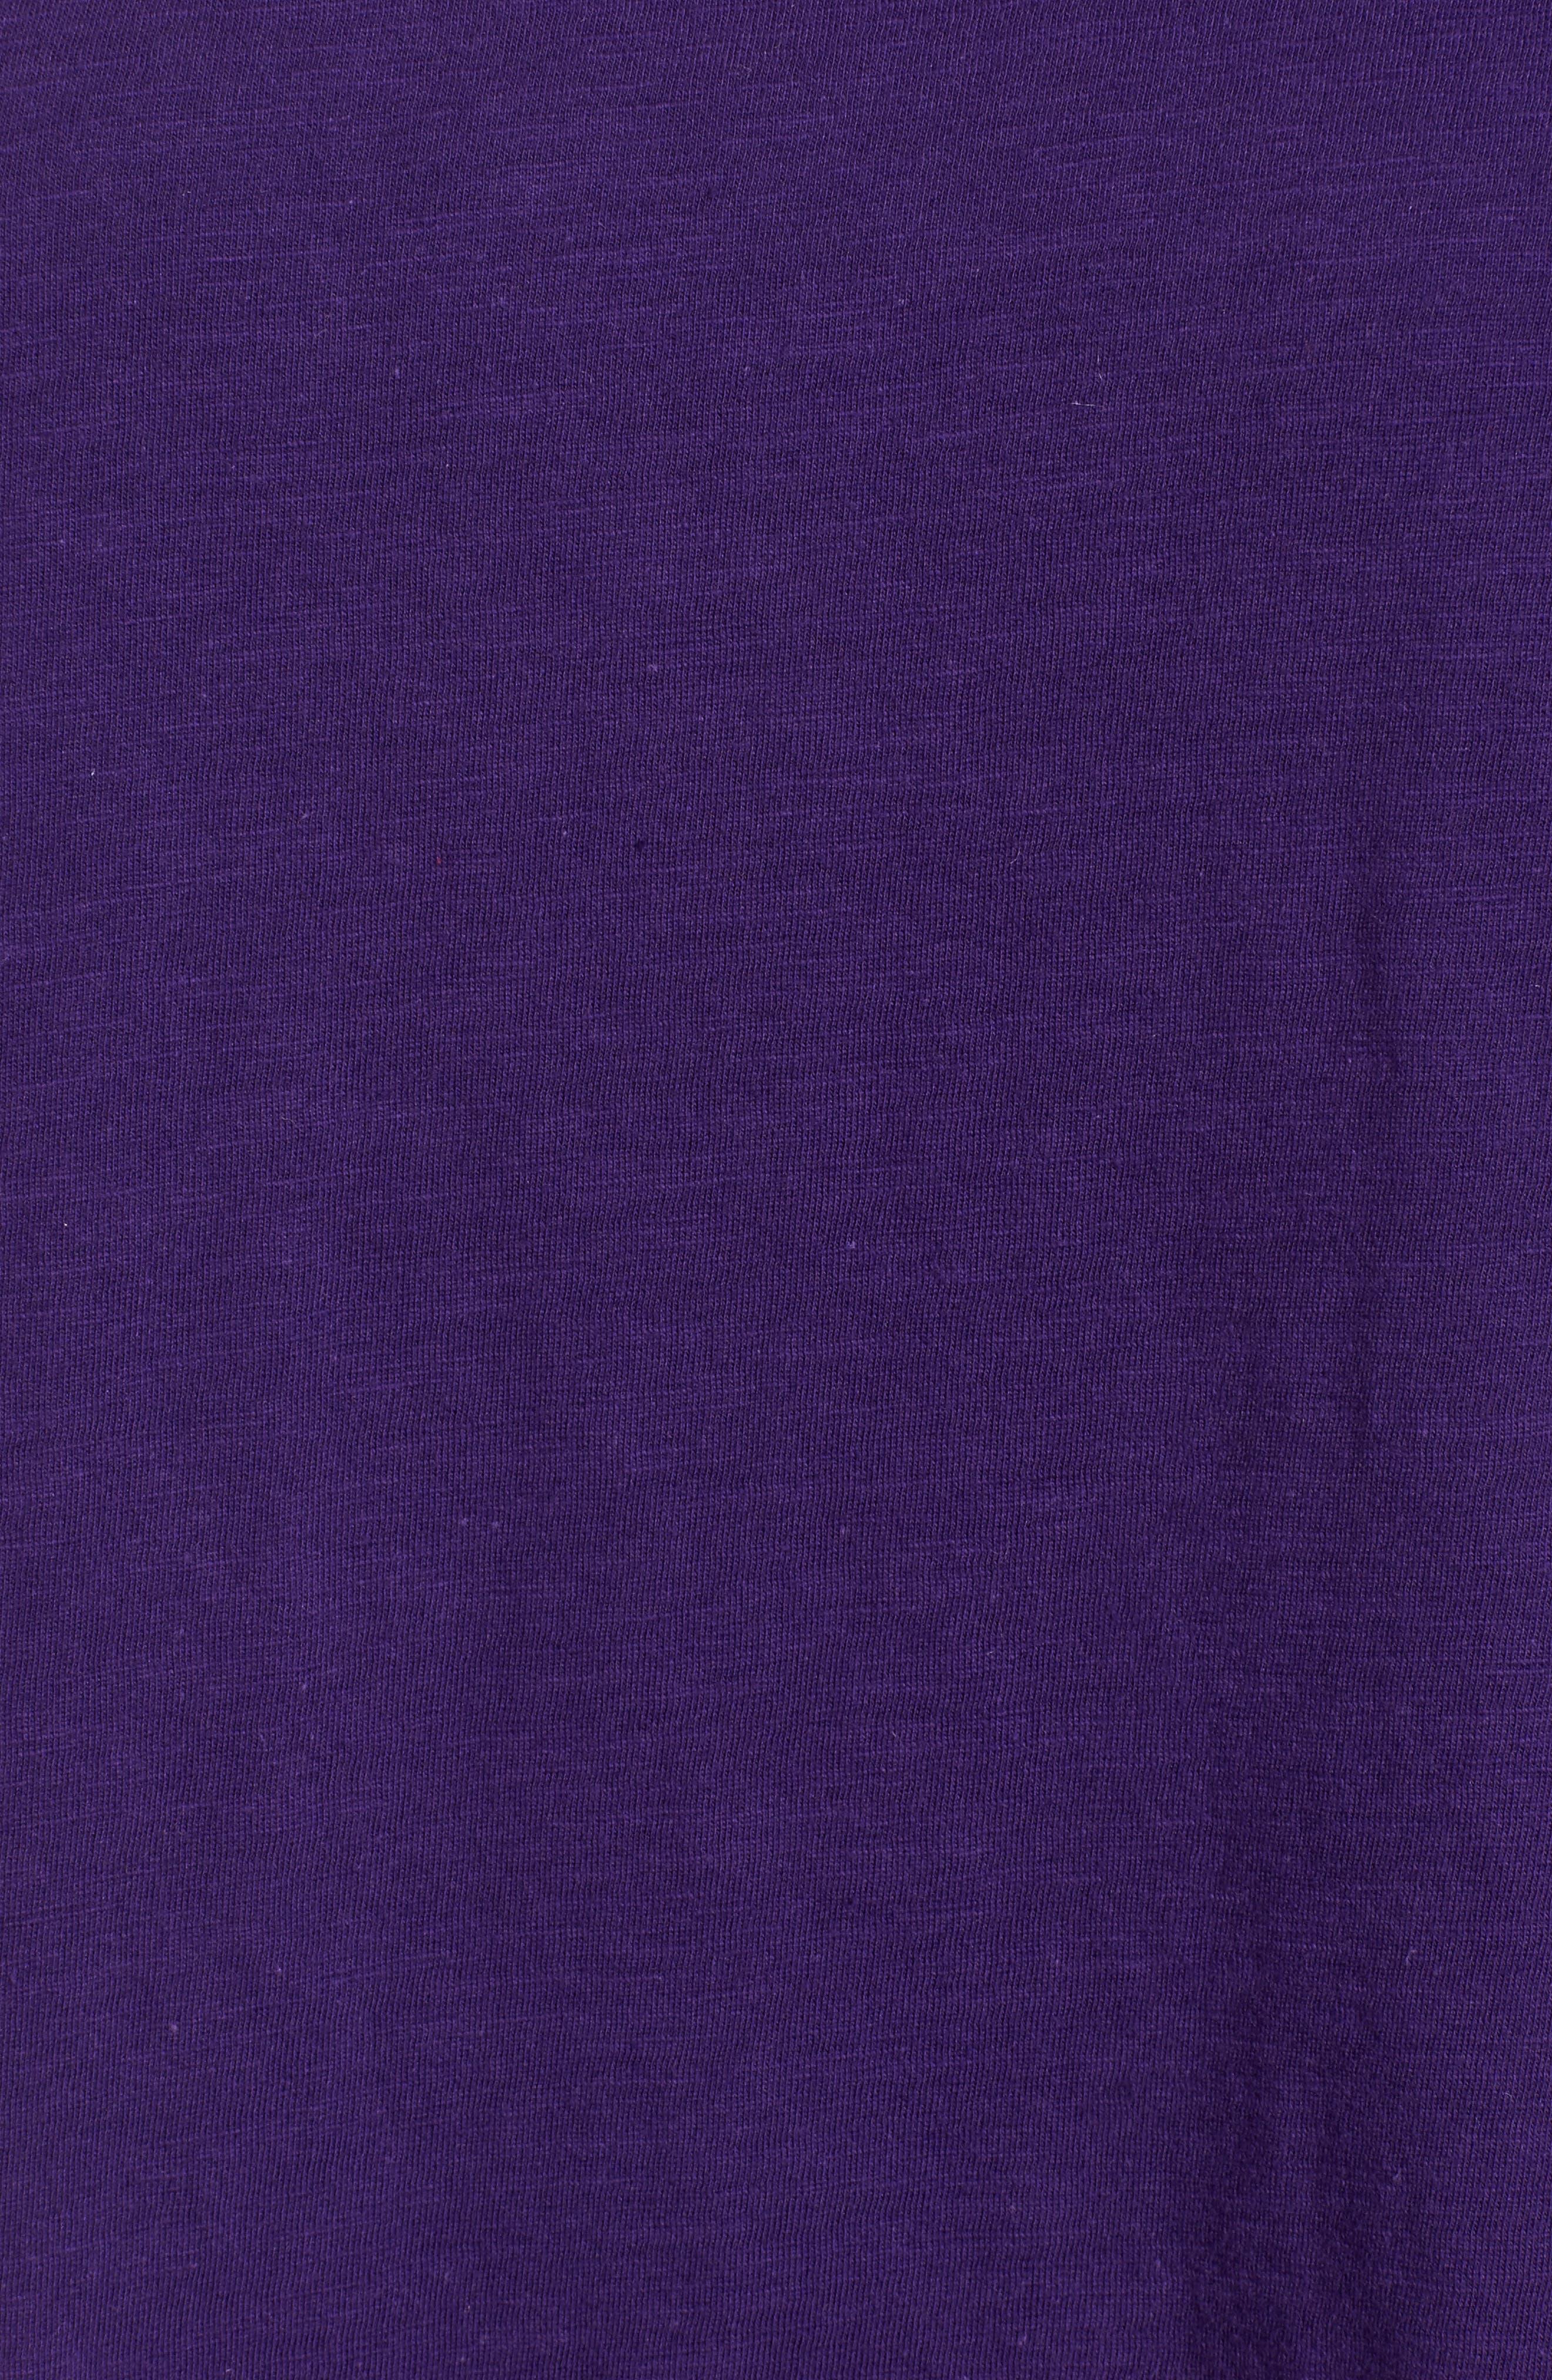 Alternate Image 5  - Eileen Fisher Organic Cotton Tee (Regular & Petite)